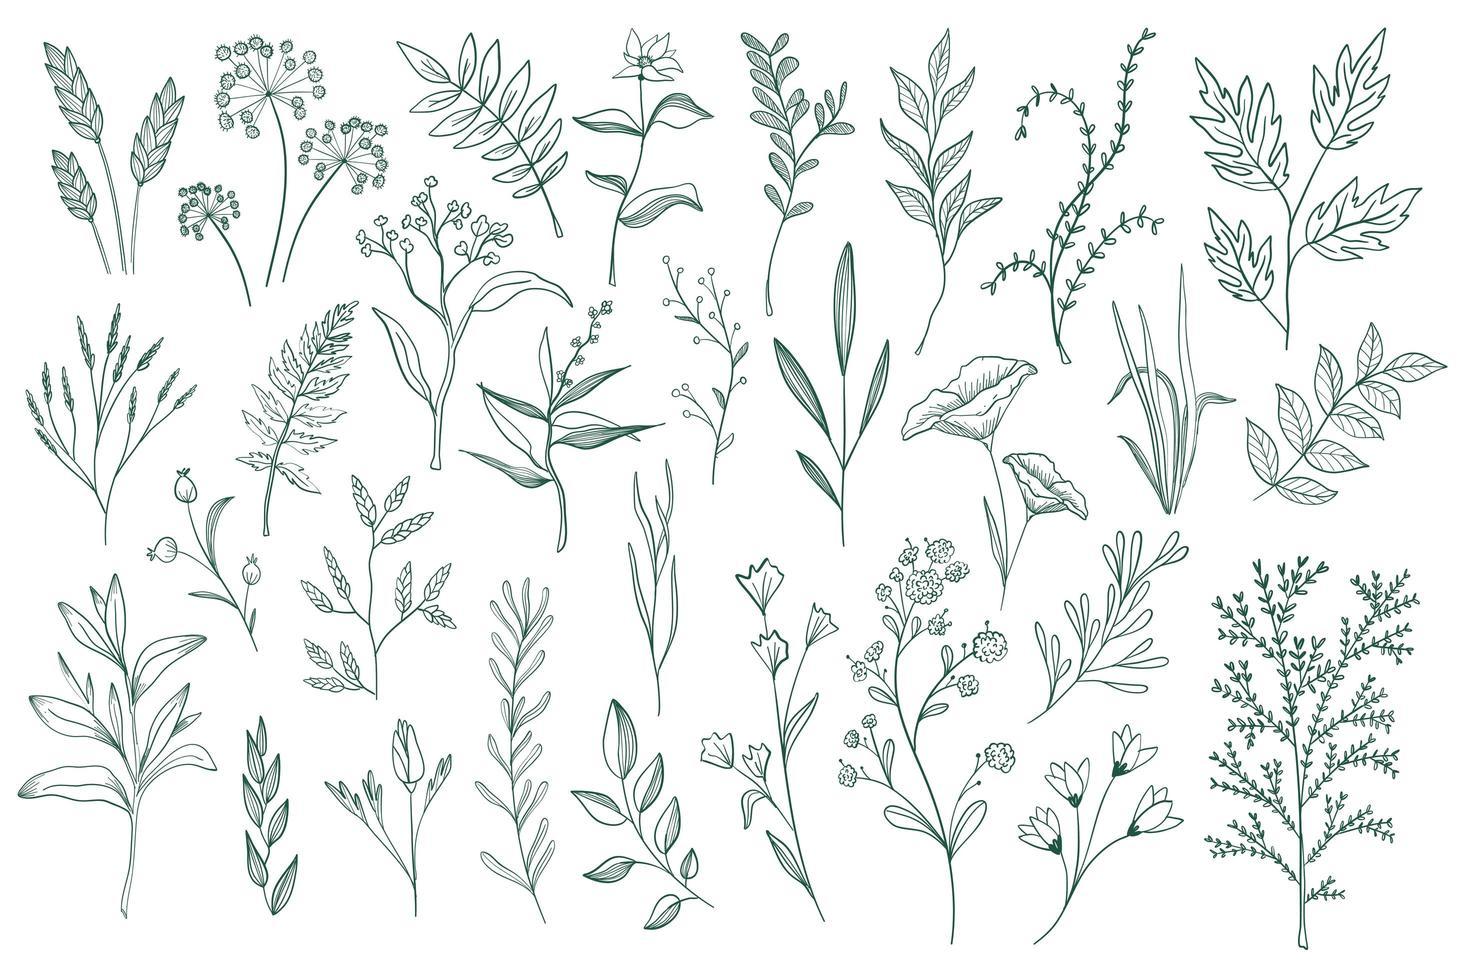 blommig dekorativa element set vektor